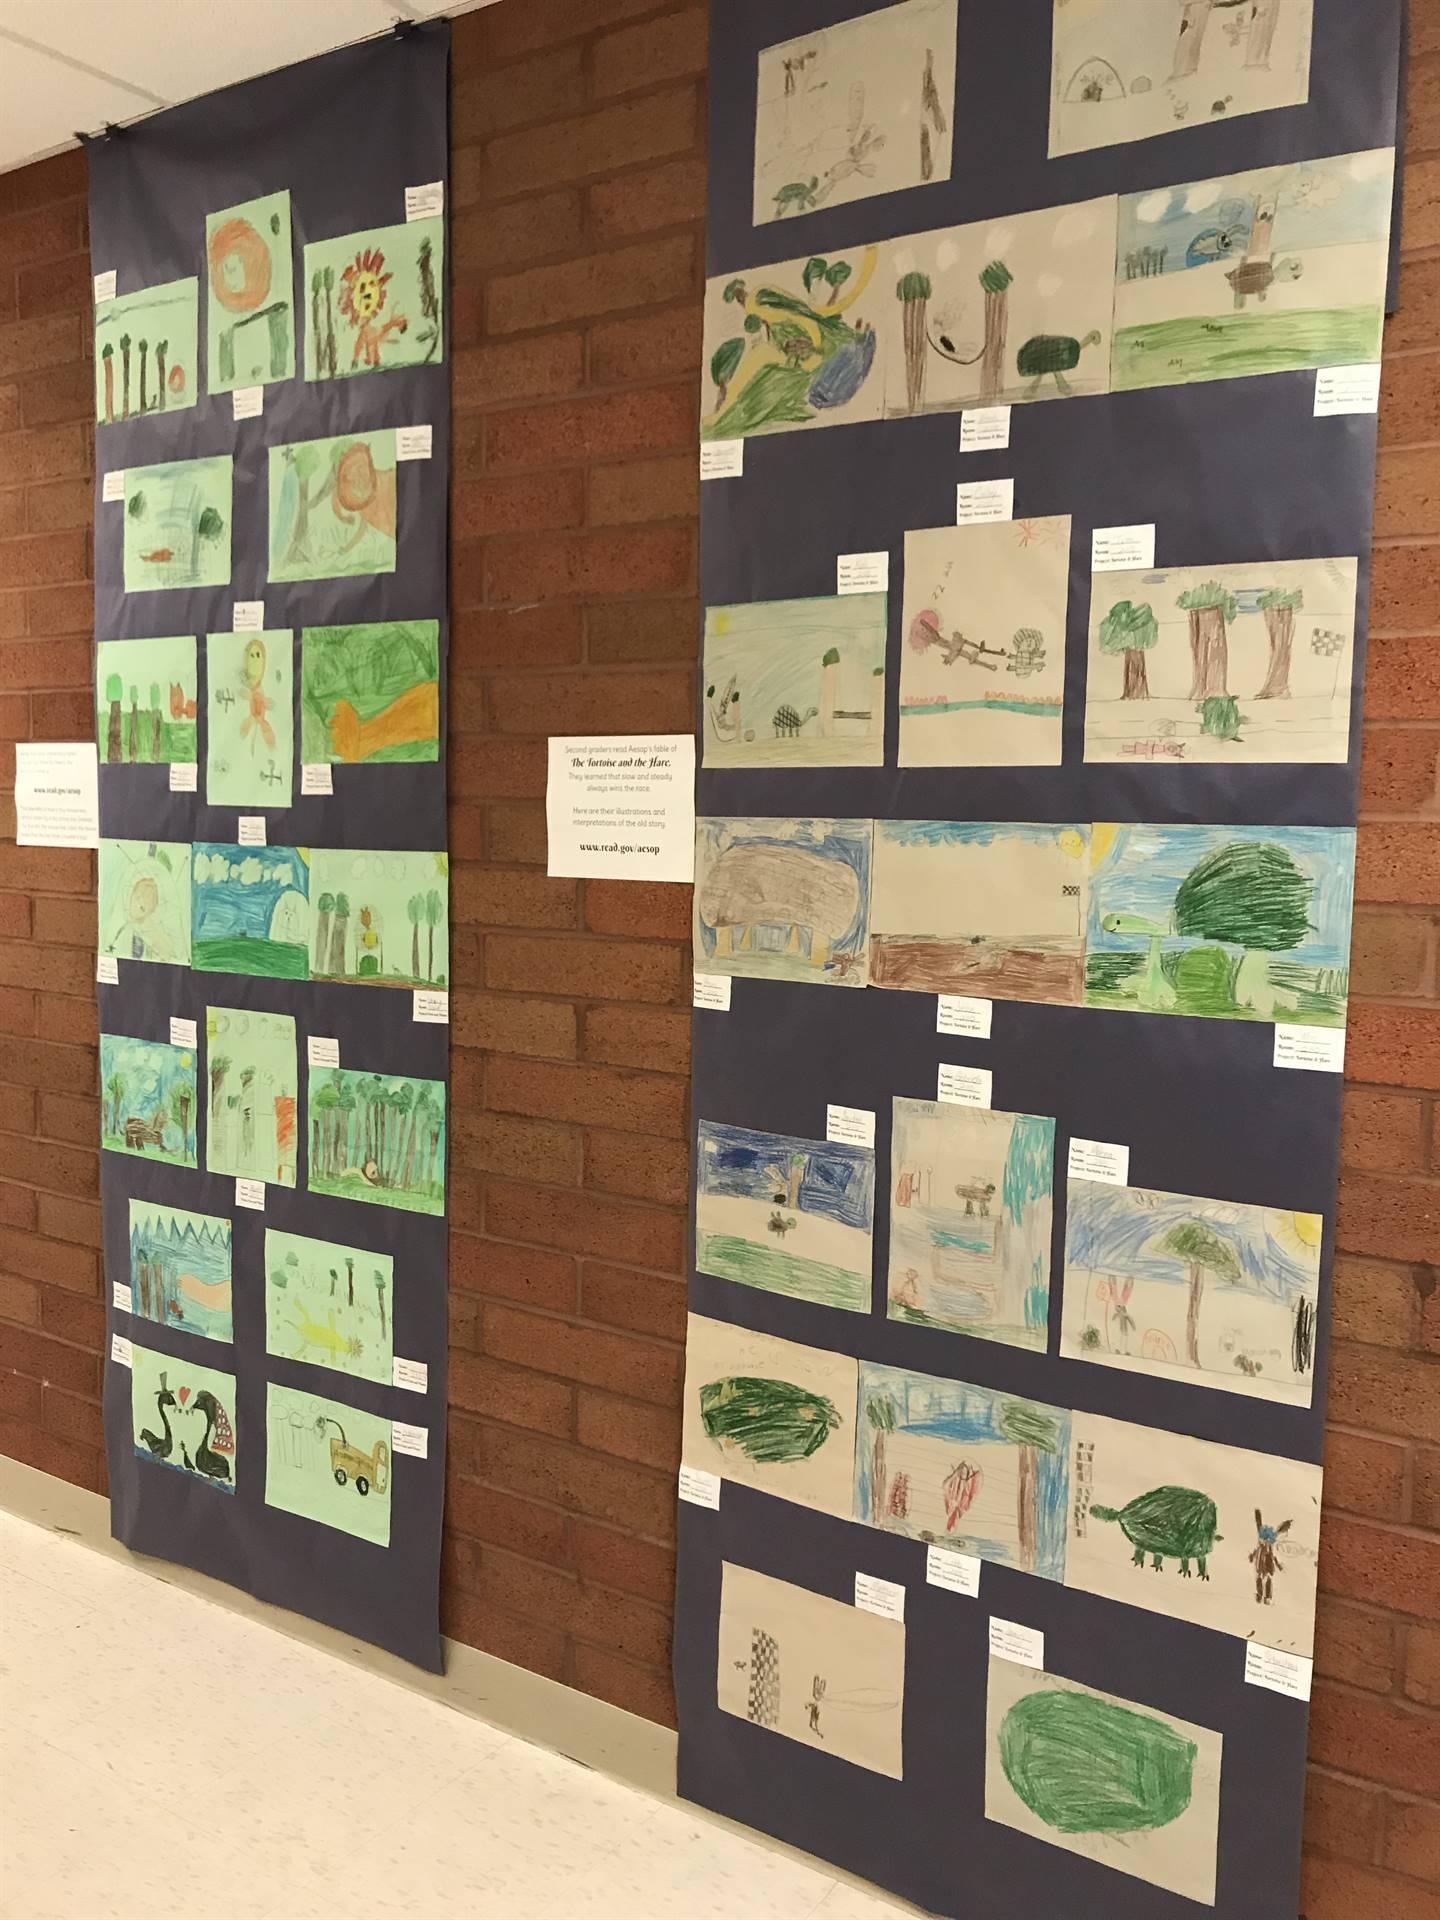 Arts Night 4.11.18 Children's Art Work displays